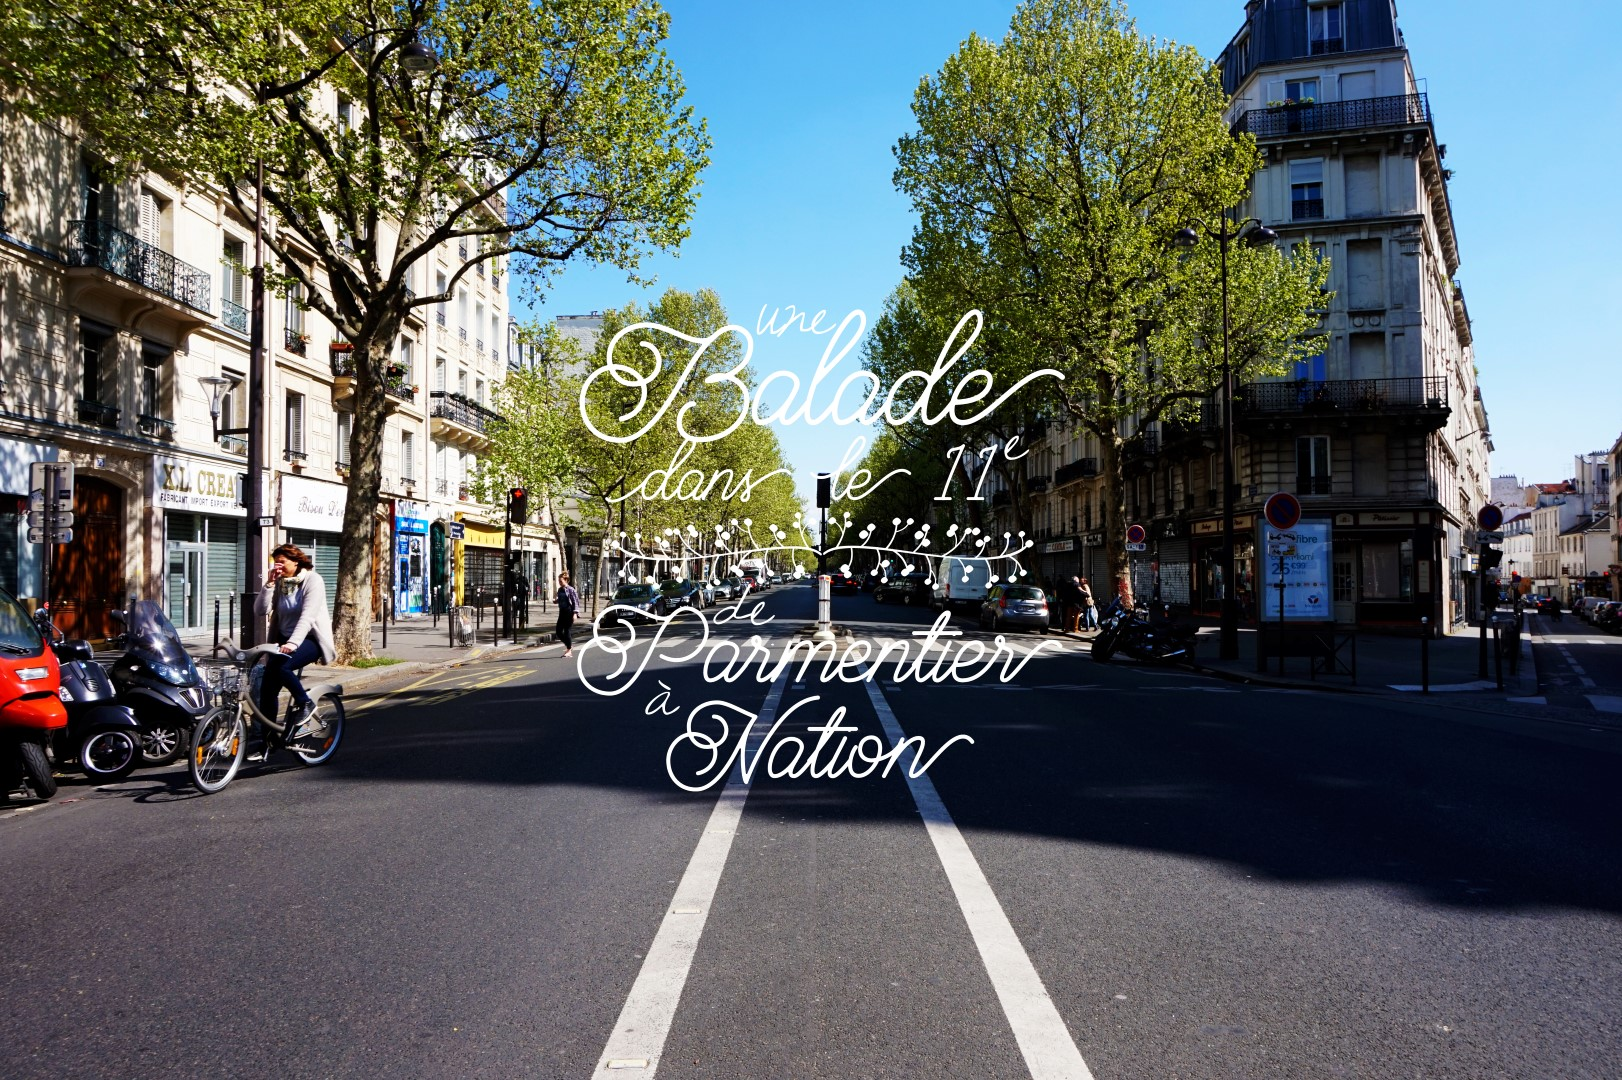 20160507_balade_11e_parmentier_nation (Large)